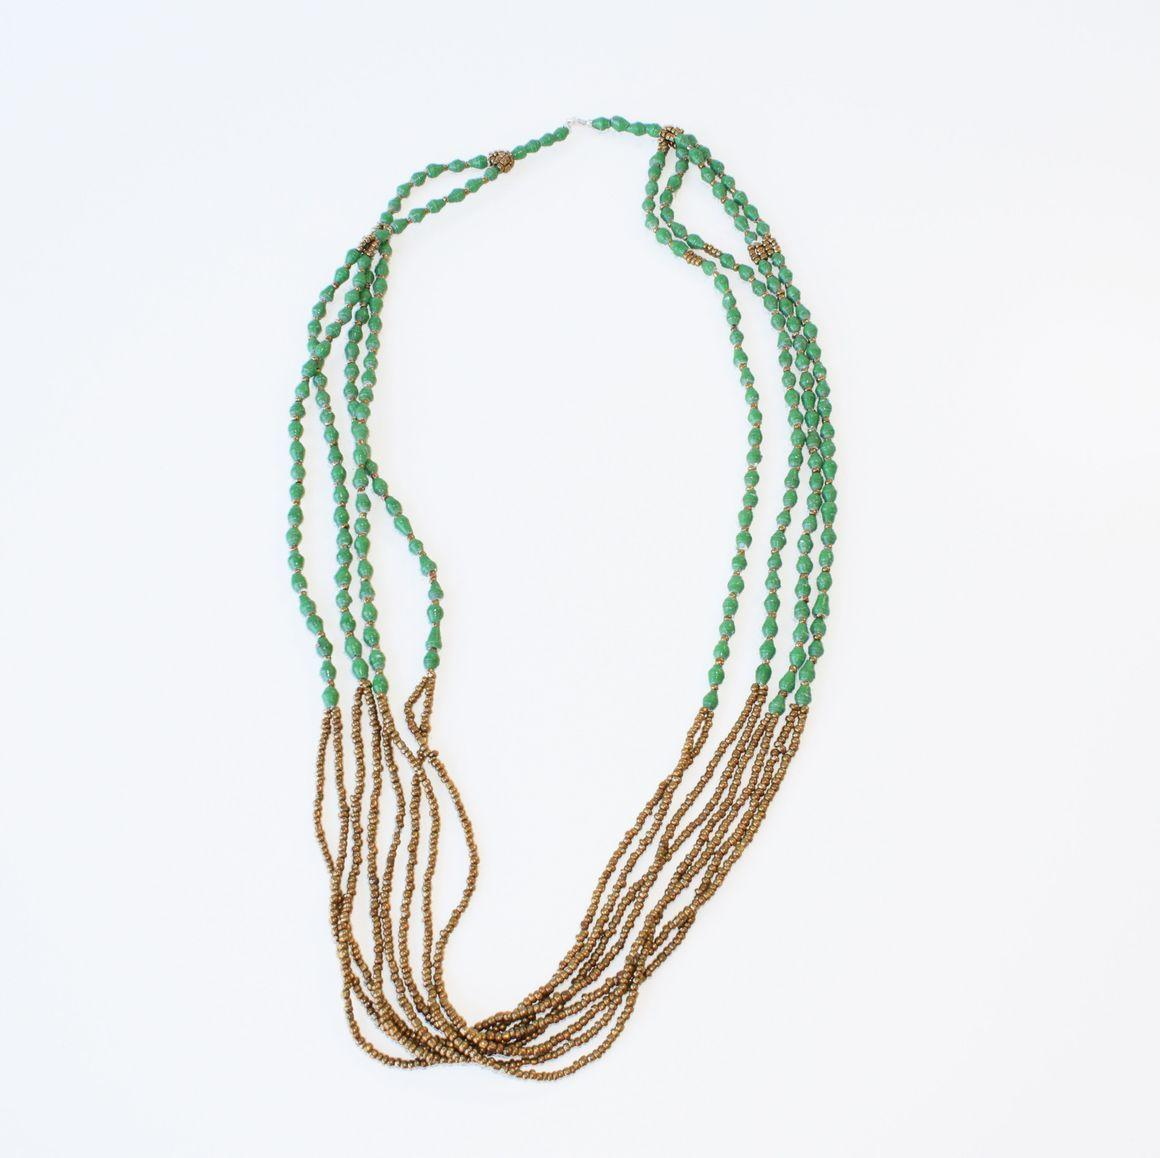 Makindye necklace | Trada Marketplace